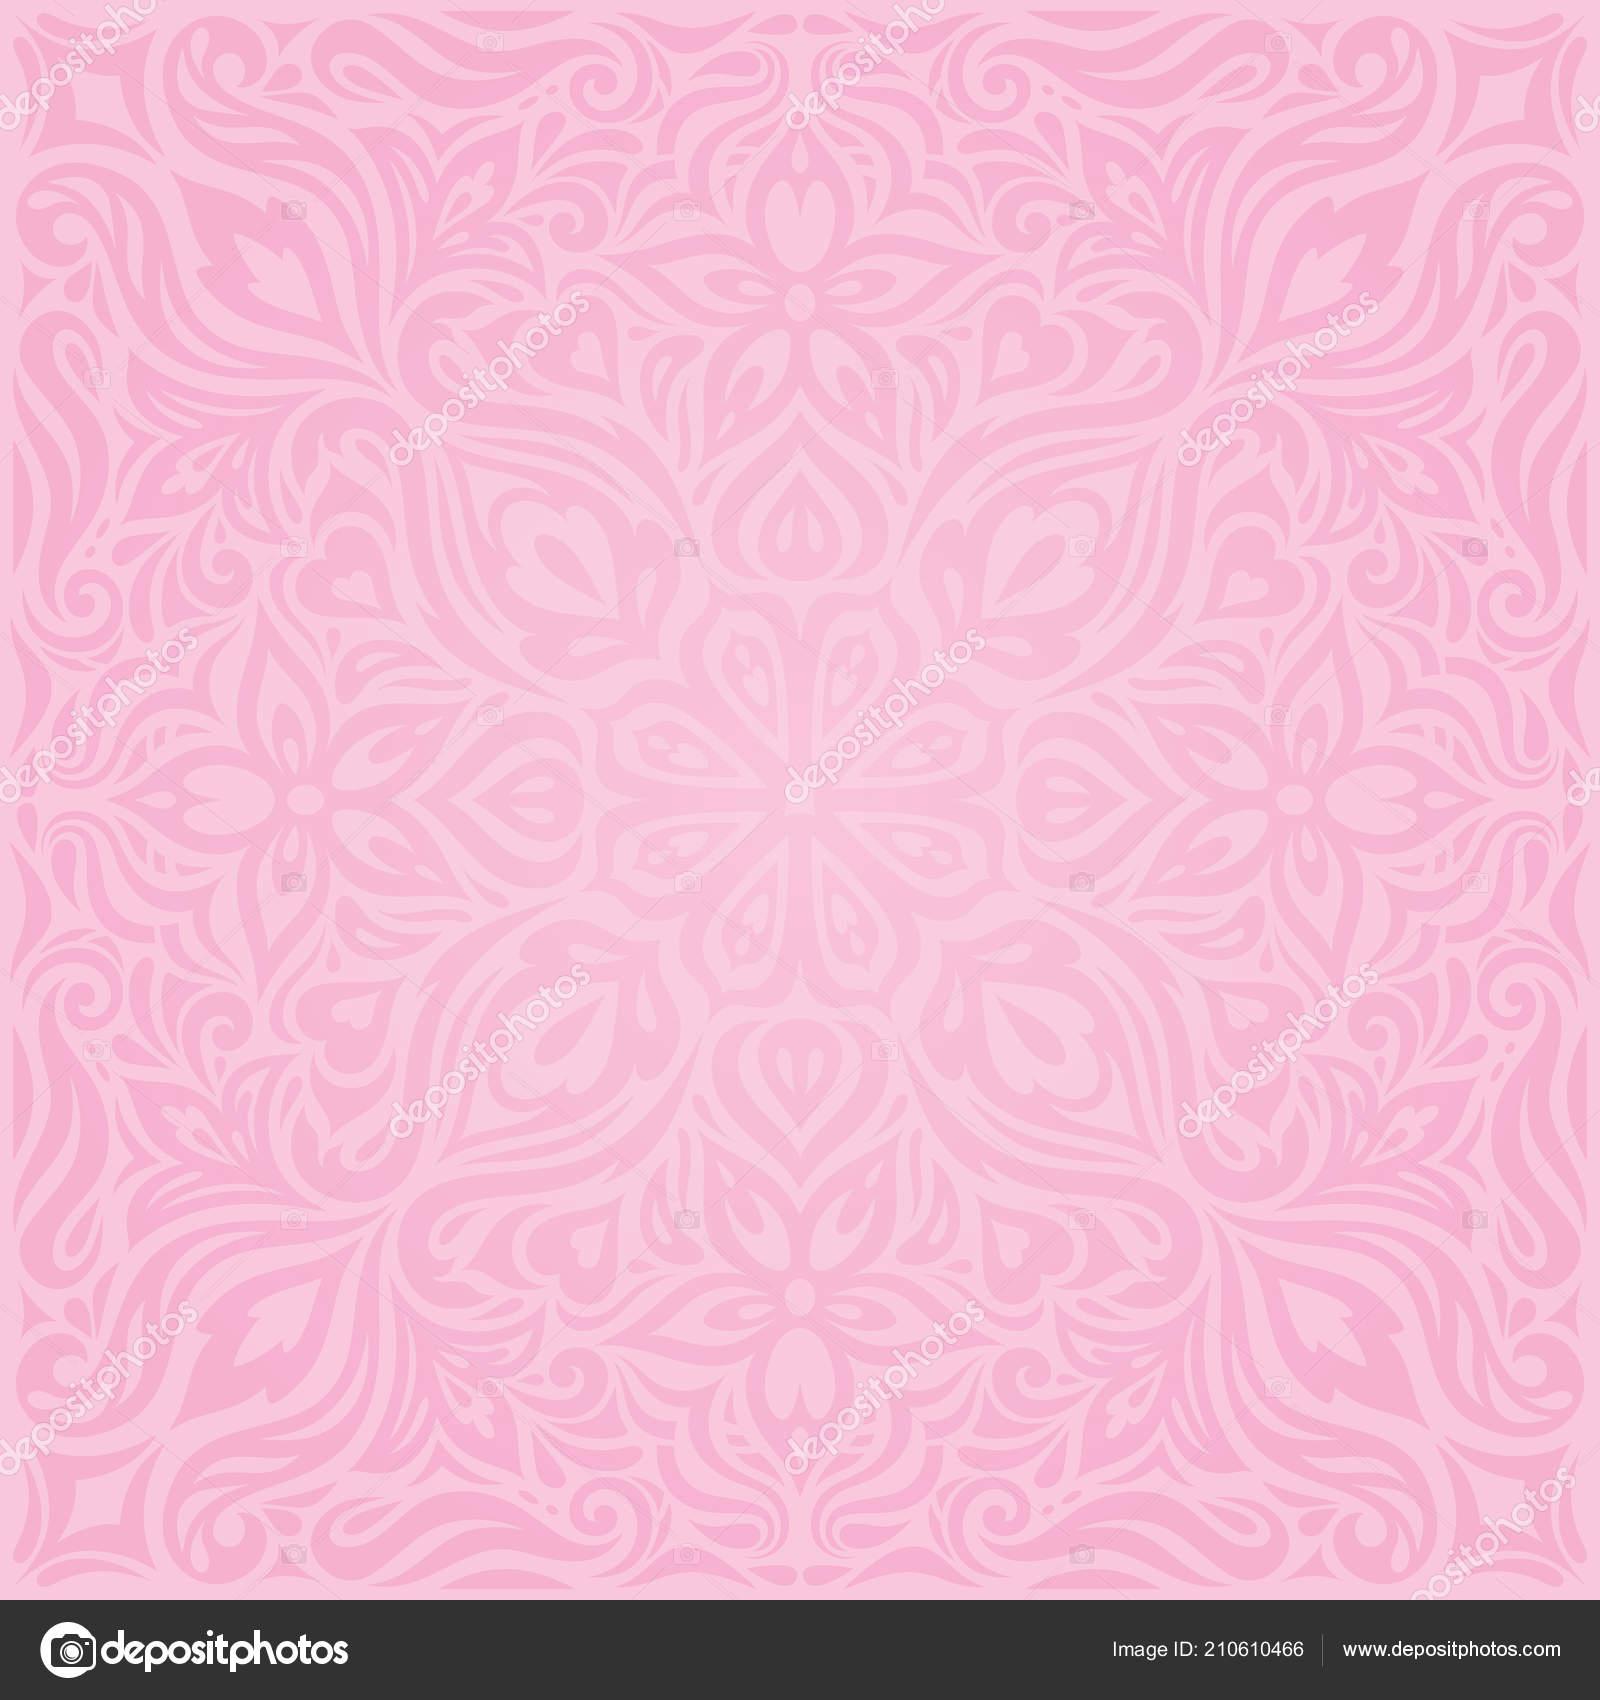 Floral Pink Vector Wallpaper Trendy Fashion Mandala Design Wedding Decorative Stock